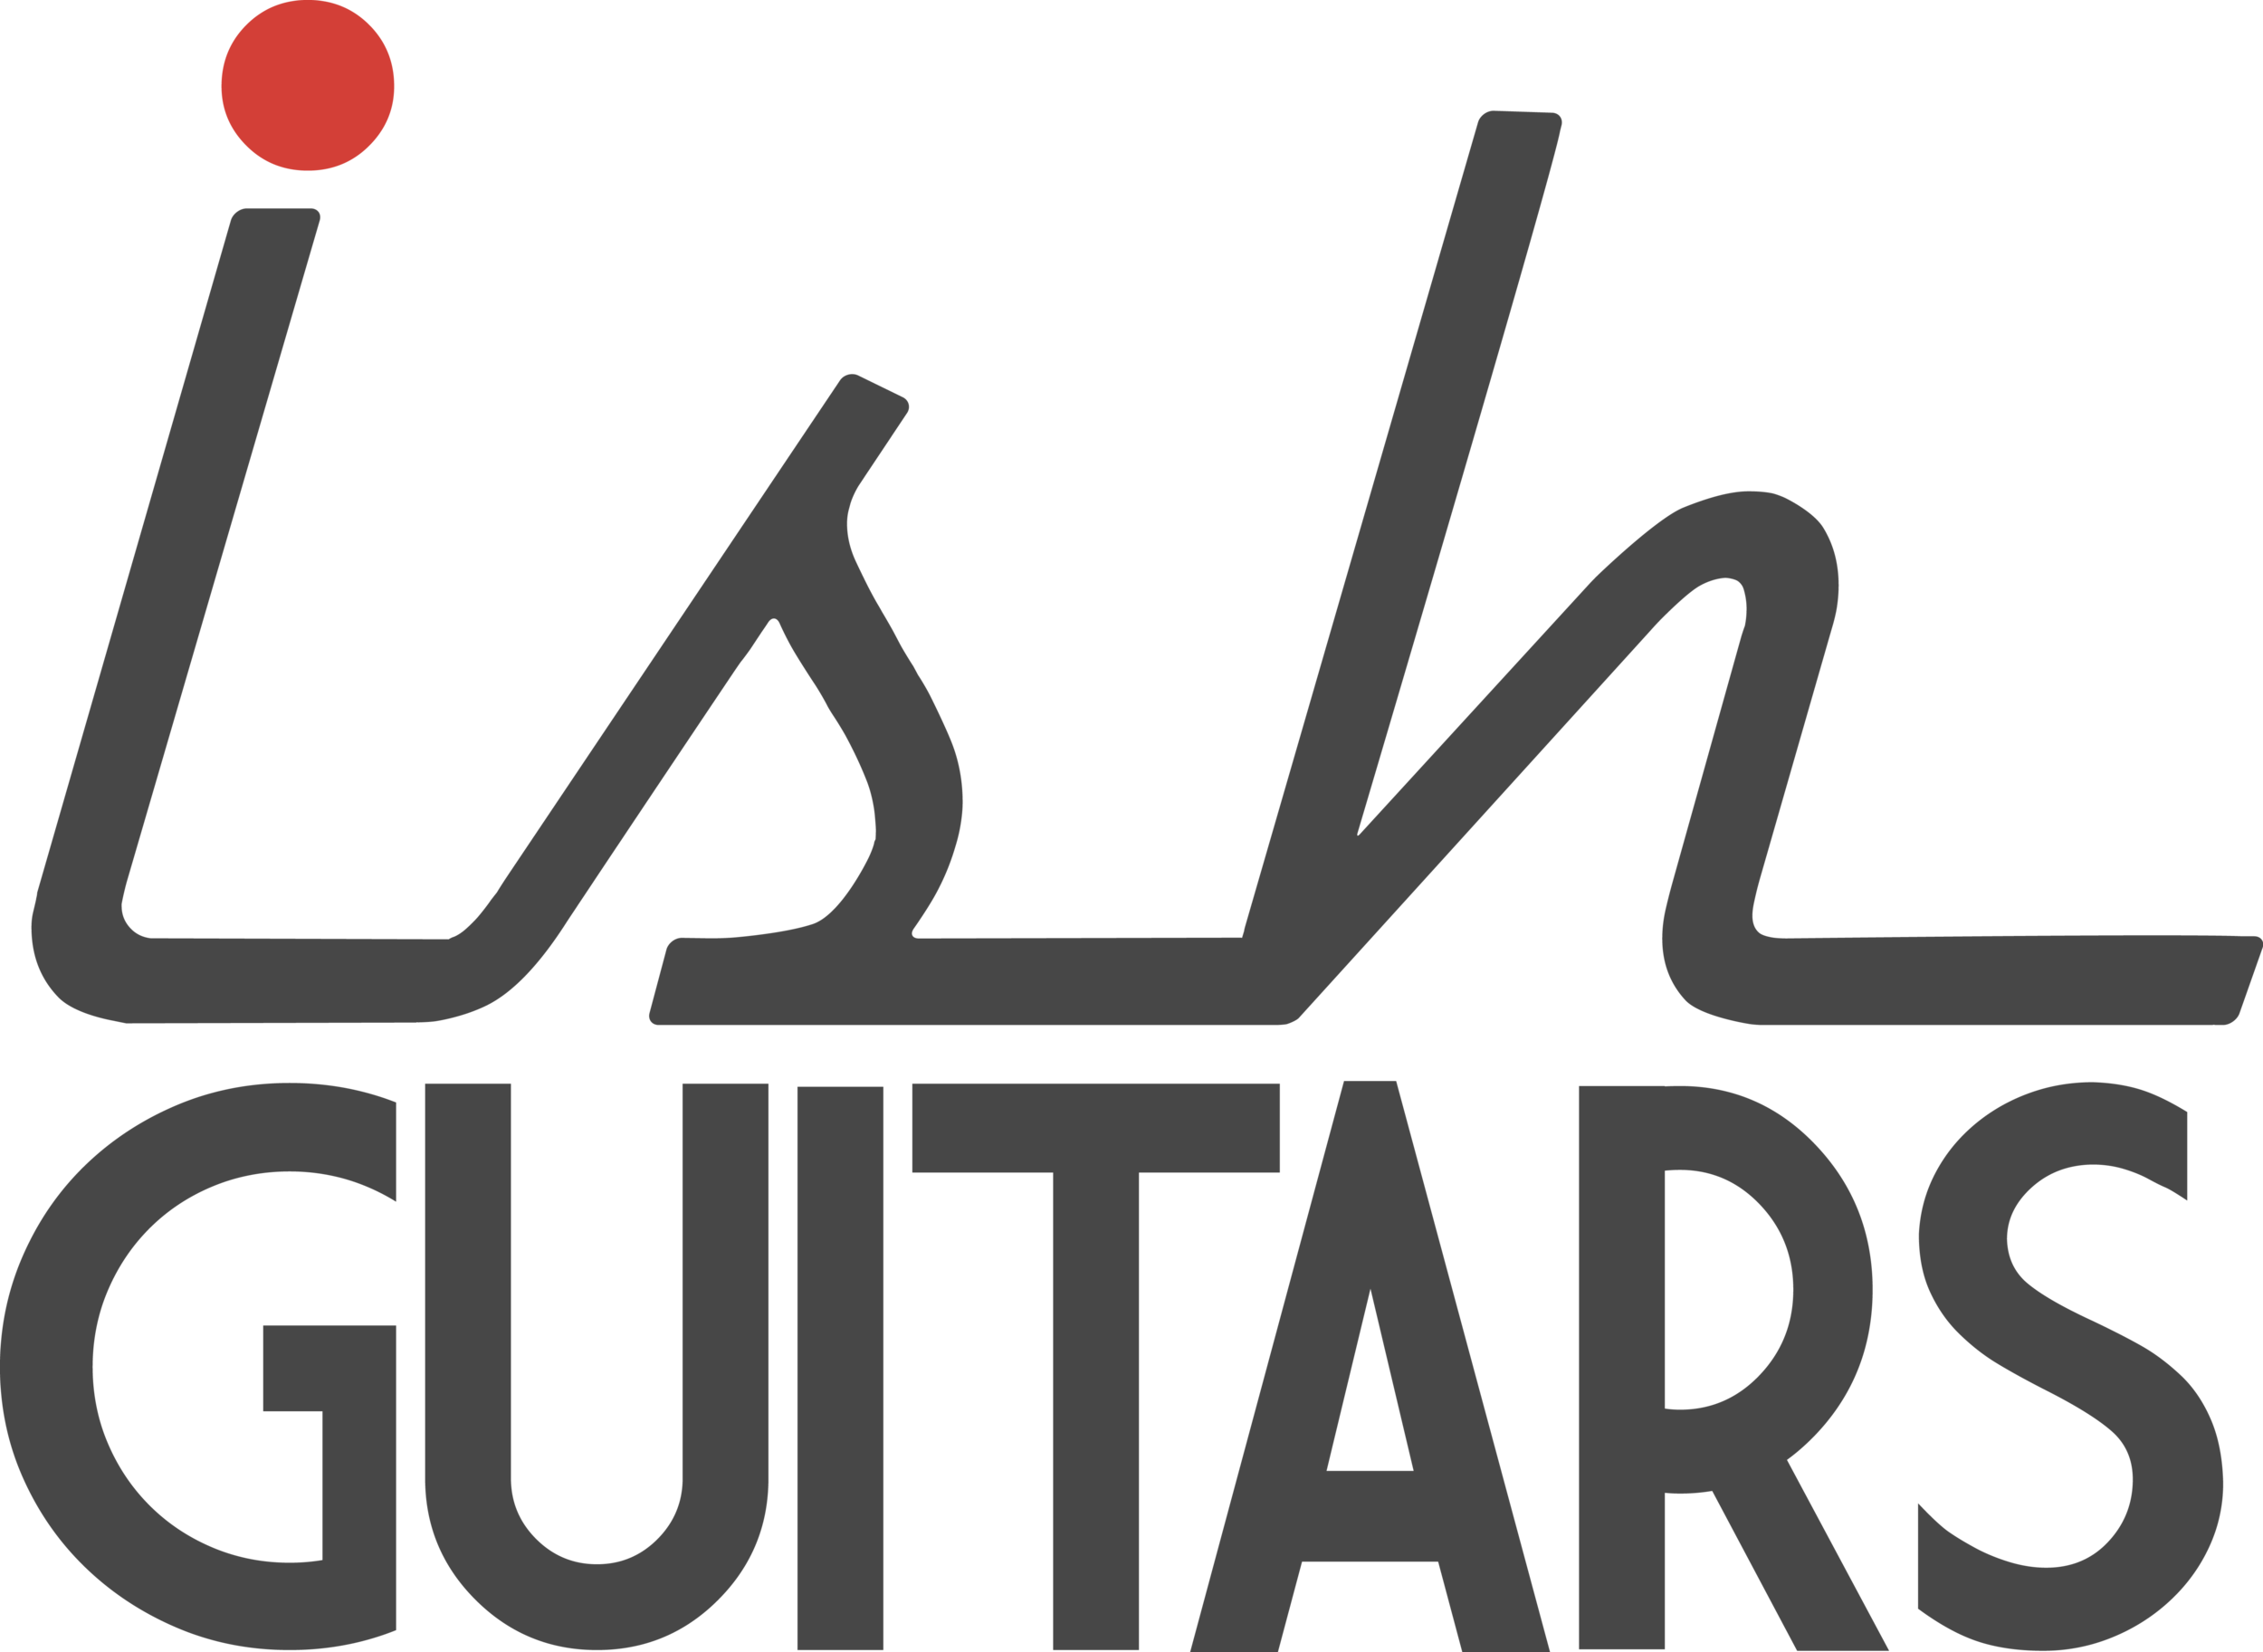 ish guitars sqaure logo large.png